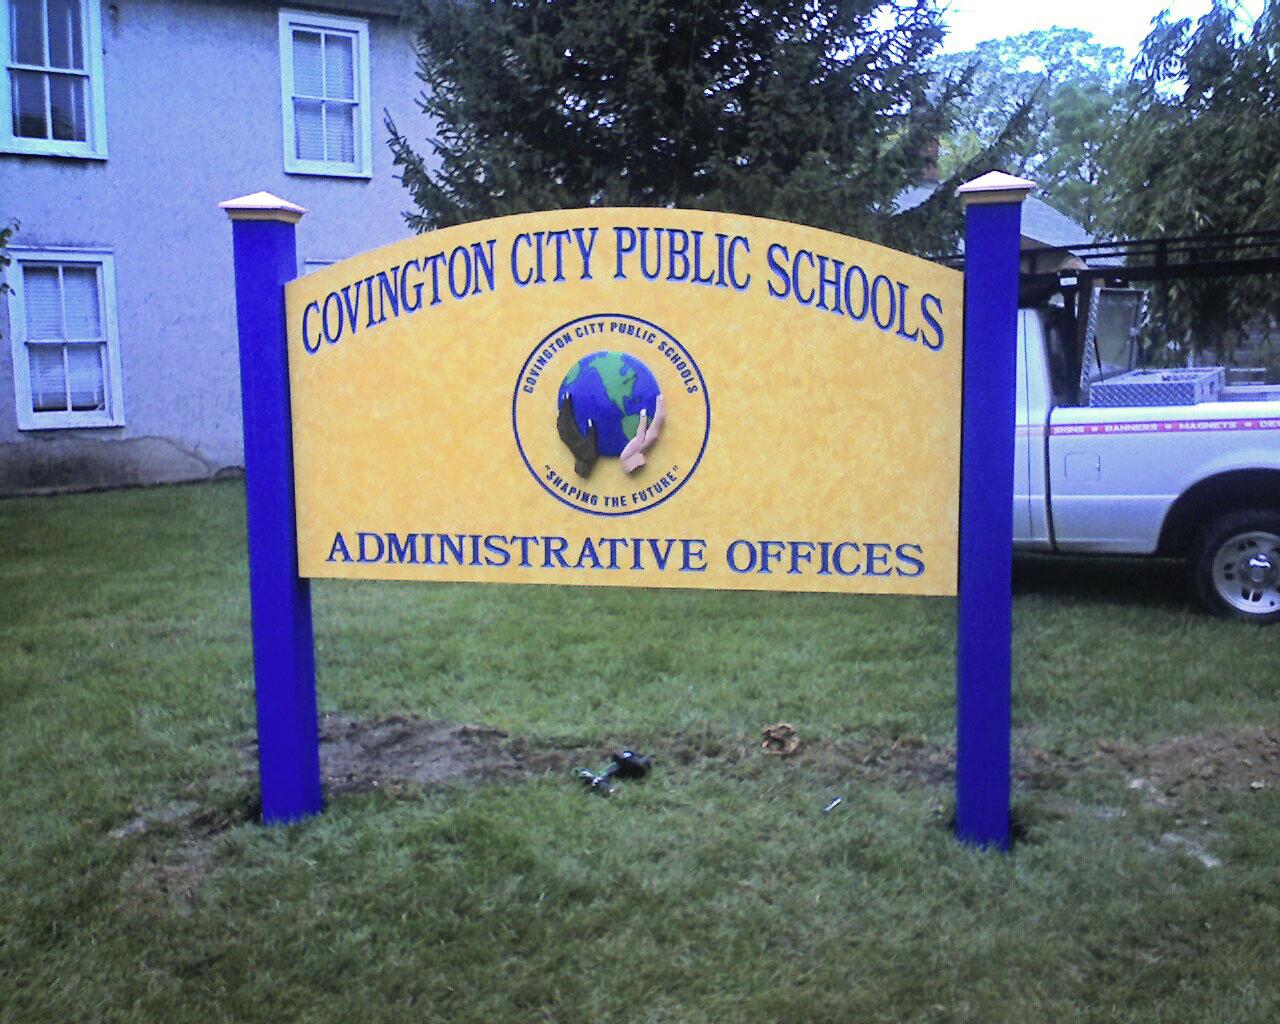 Custom made sign of a public school in Covington, VA